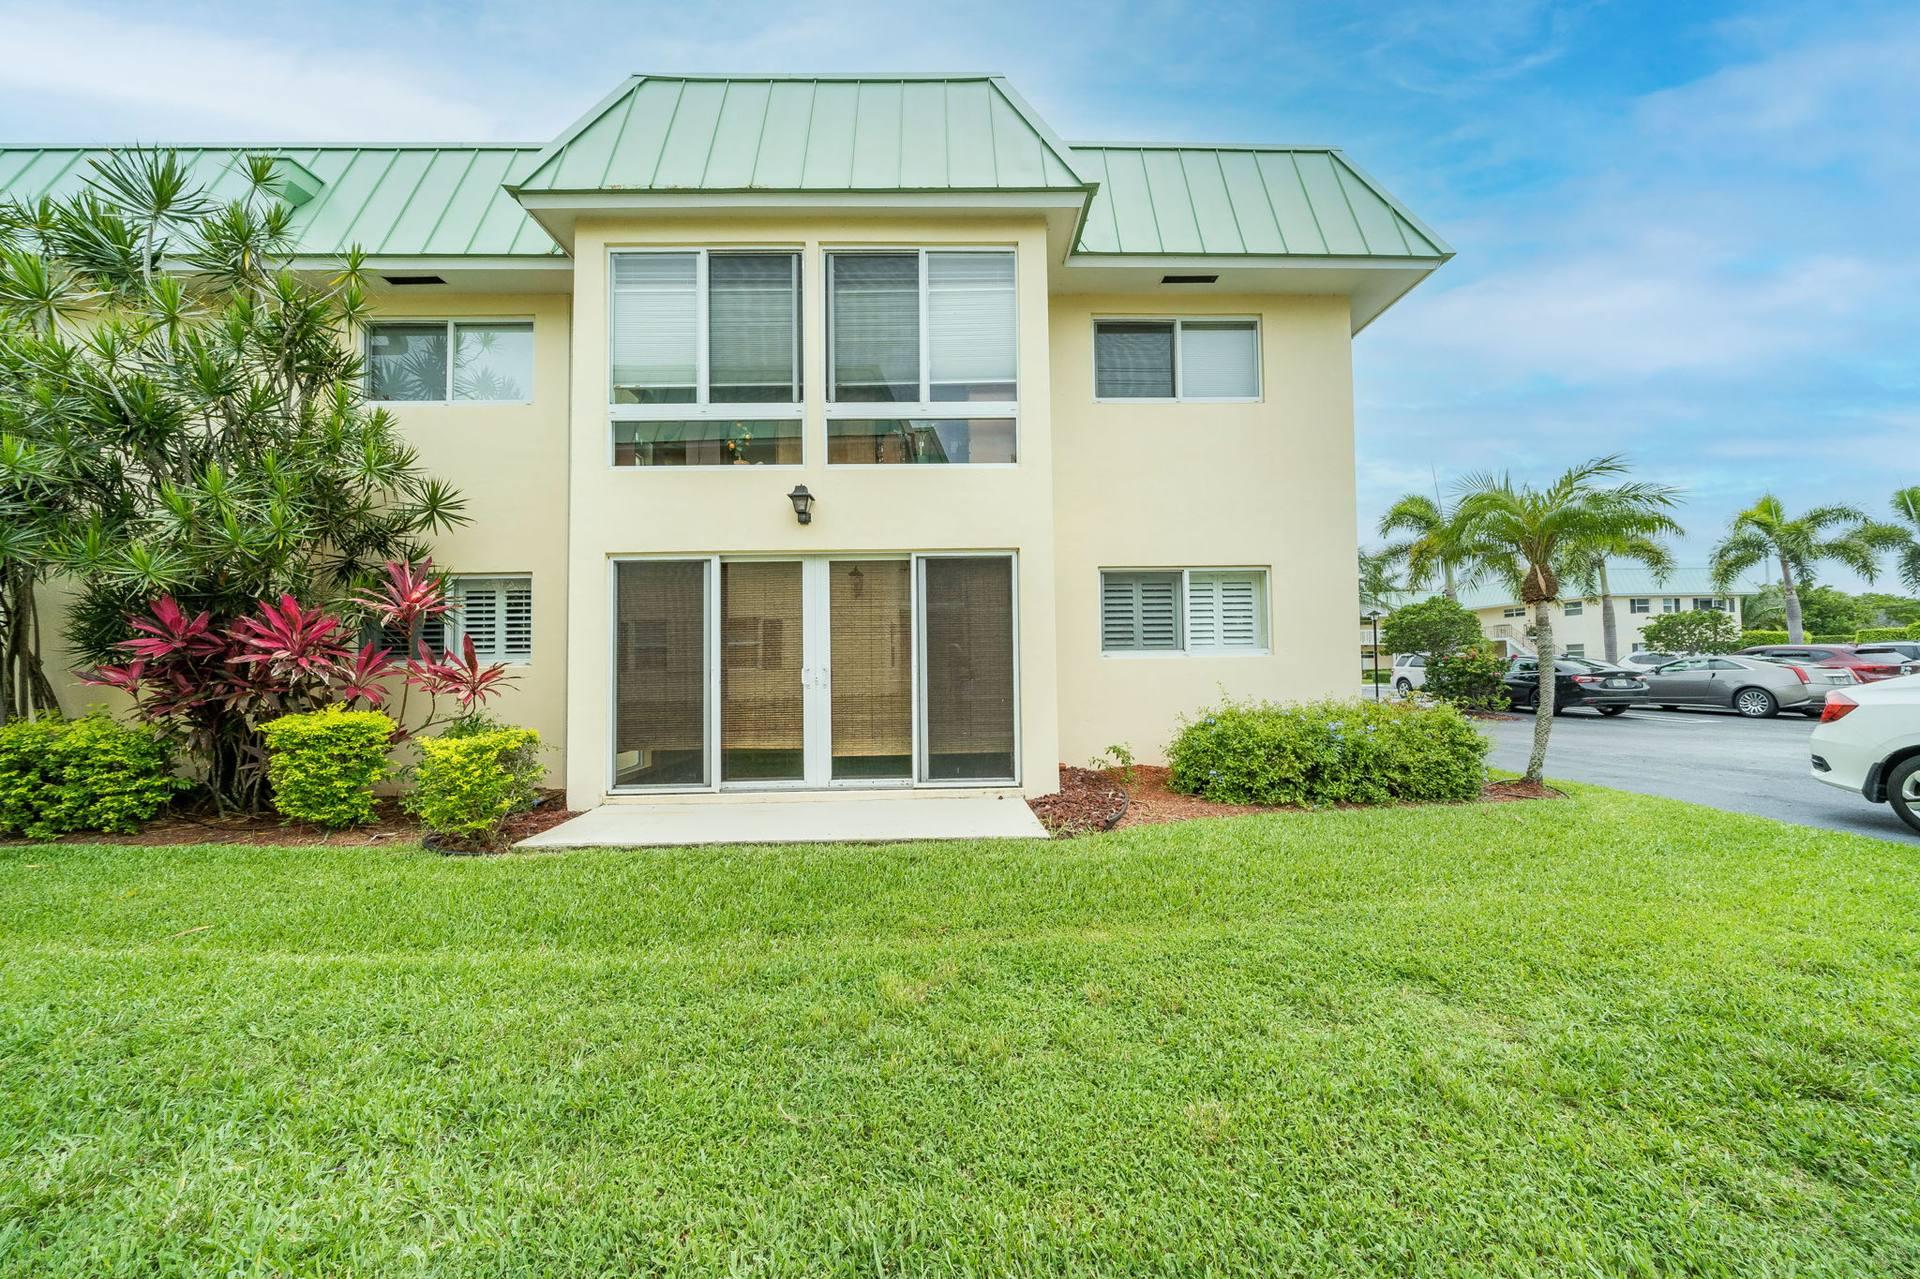 33 Colonial Club Dr 100, Boynton Beach, FL 33435, US